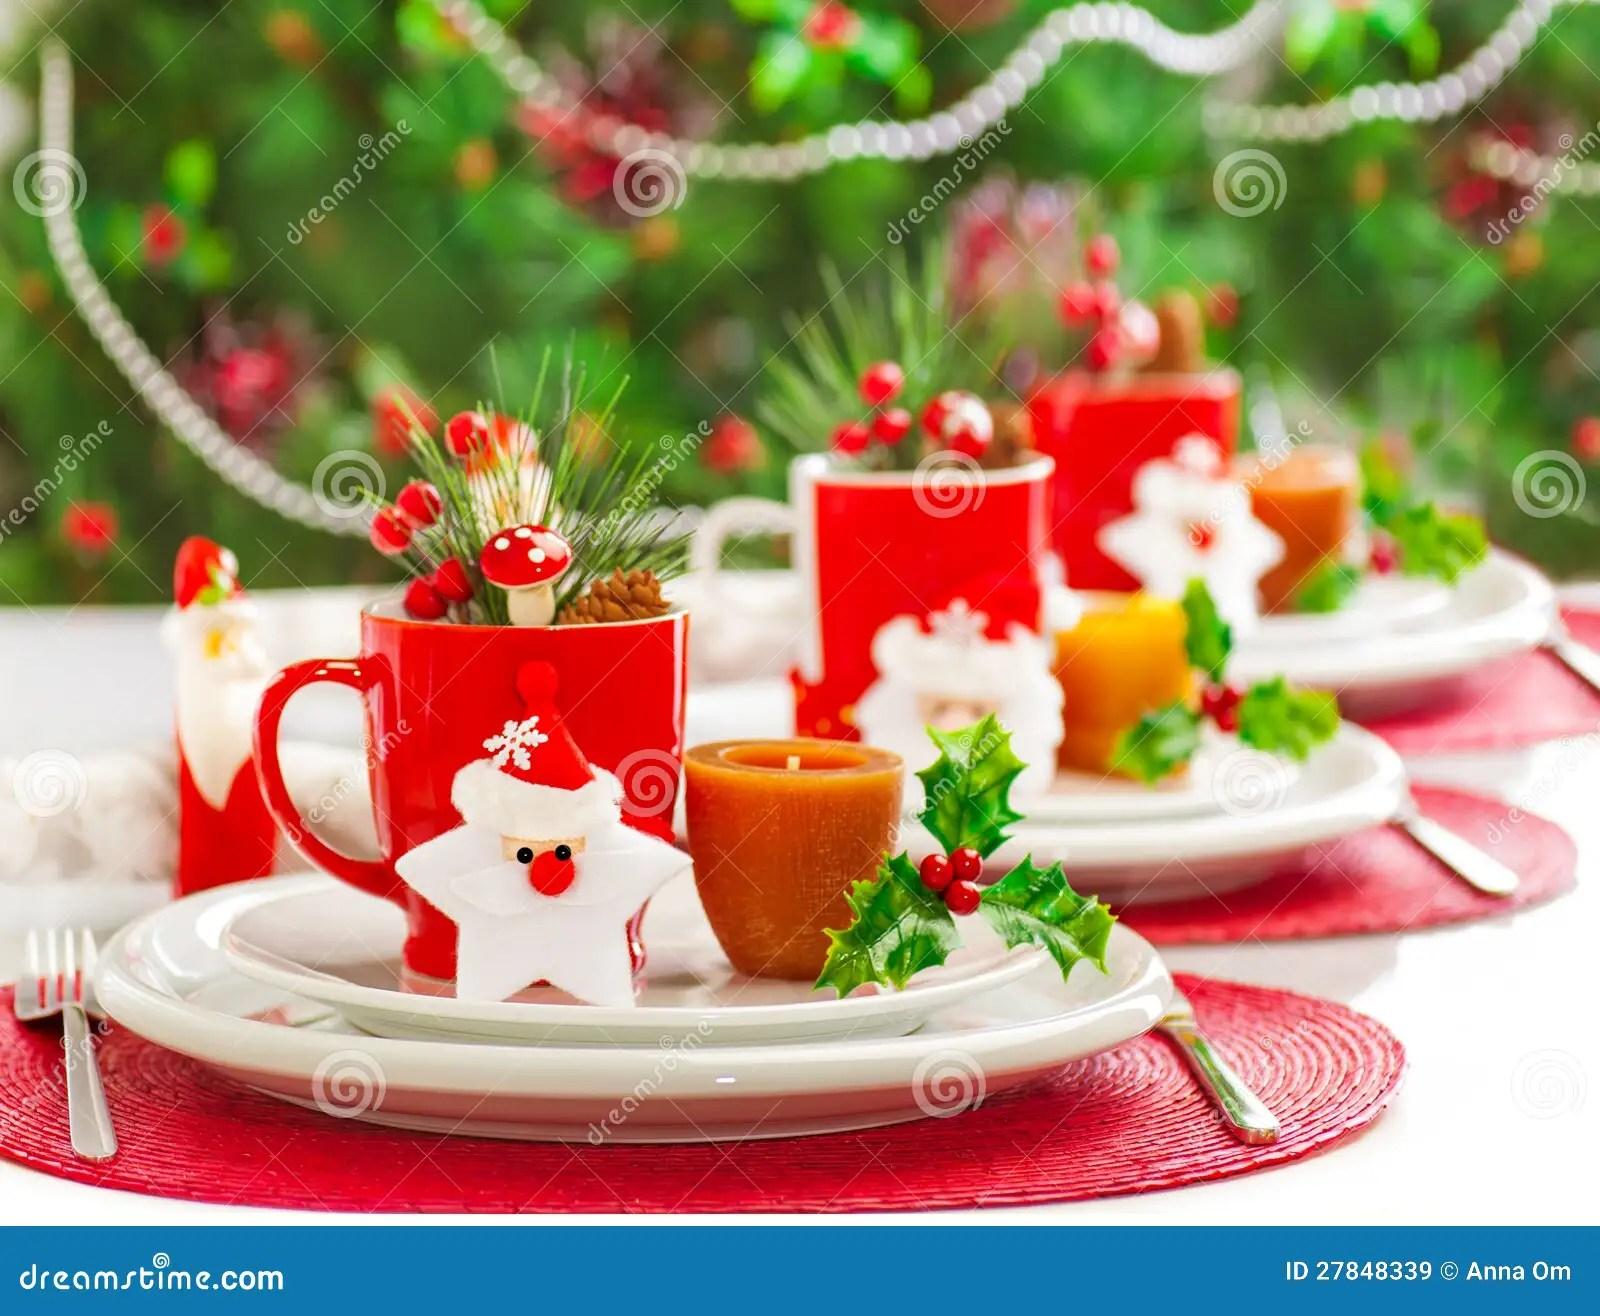 Christmas Dinner Decoration Stock Image Image 27848339